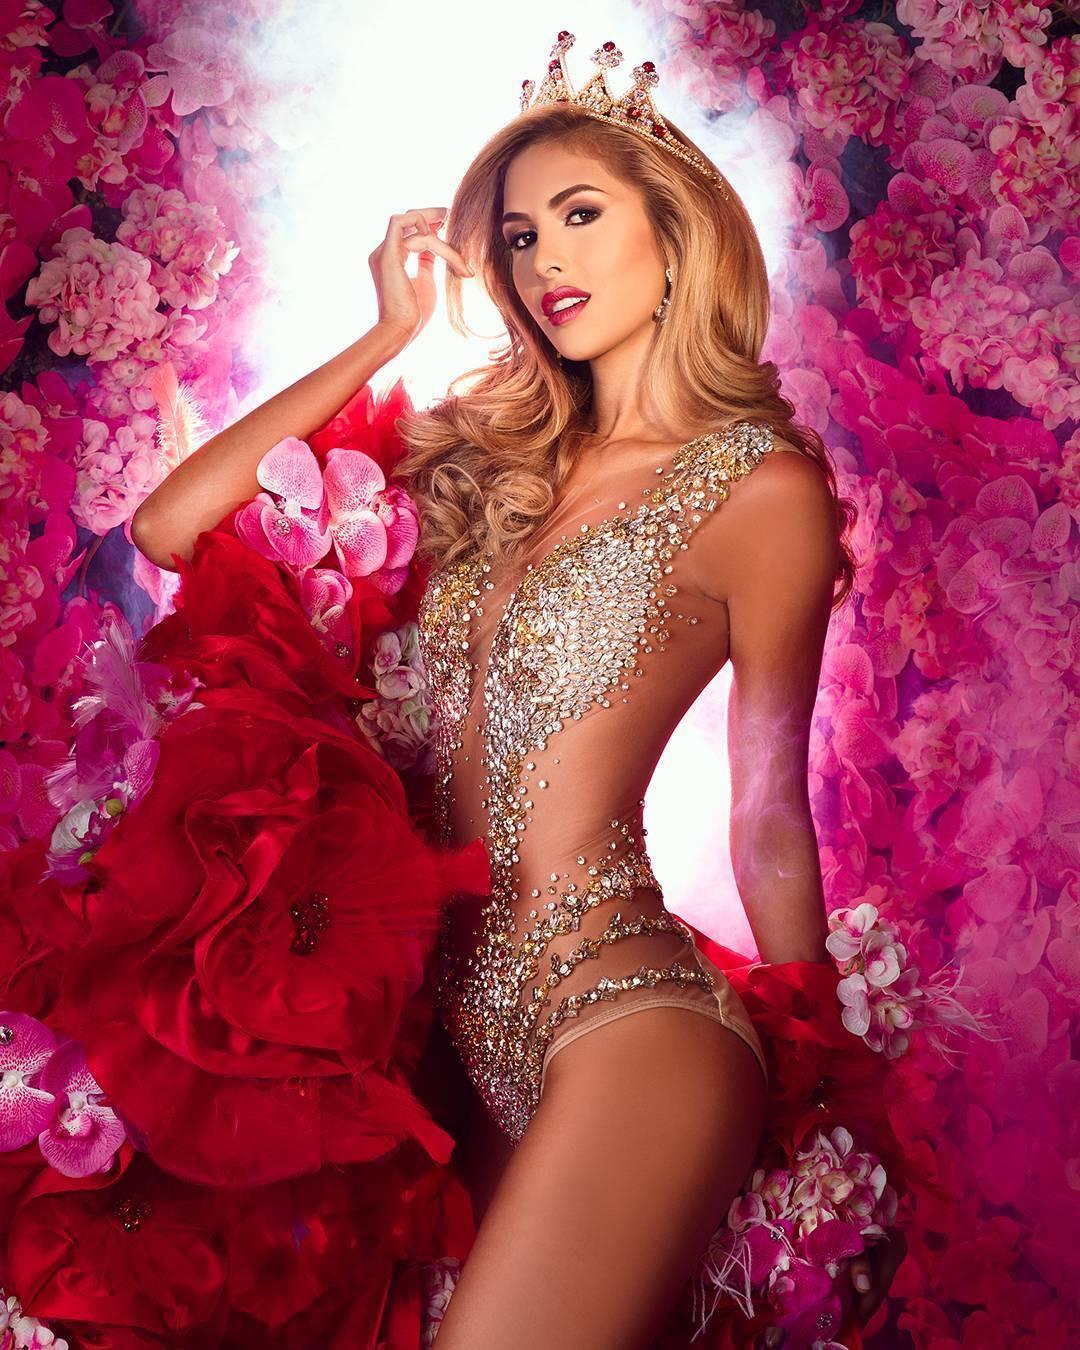 Sofía Santa Rodríguez Correa Finalist Miss Venezuela 2017 (Photo Courtesy: Miss Venezuela/Facebook Official)